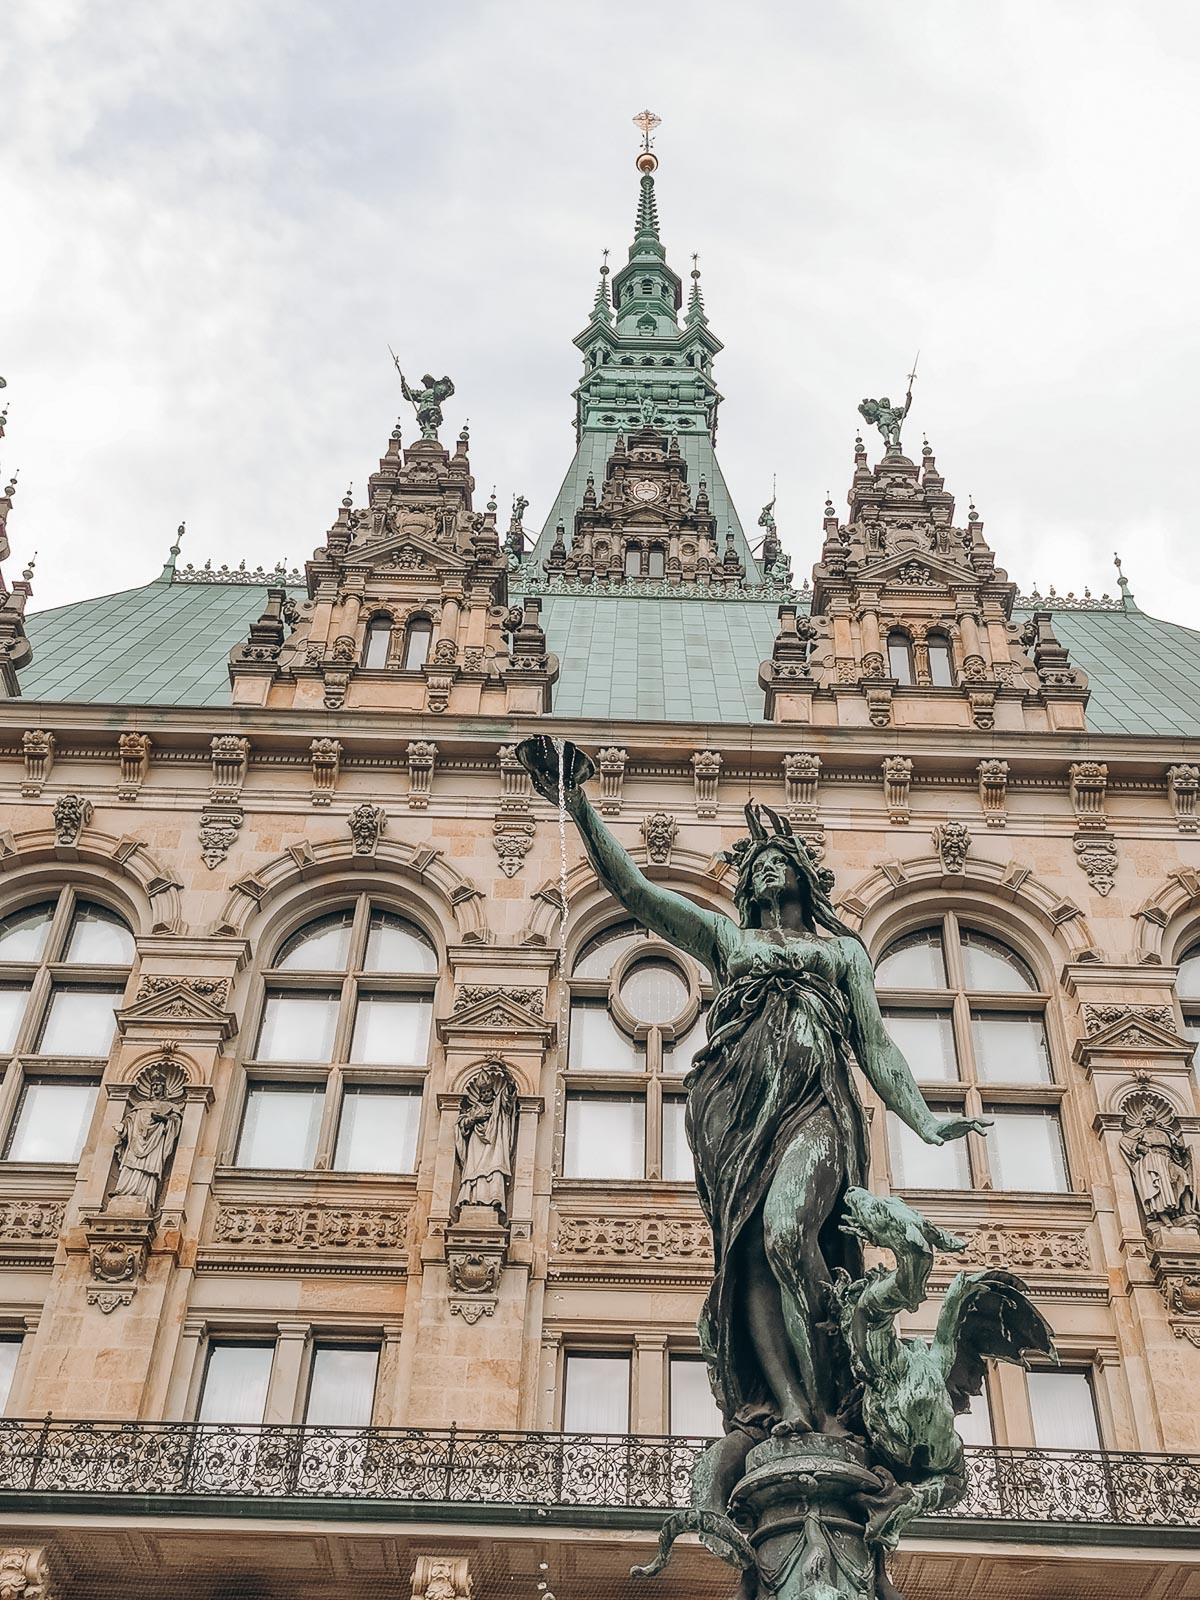 Hamburg, Hamburg nachhaltig, nachhaltig reisen, Städtetrip Hamburg nachhaltig, Hamburg 2020 nachhaltig, Nachhaltigkeit Hamburg